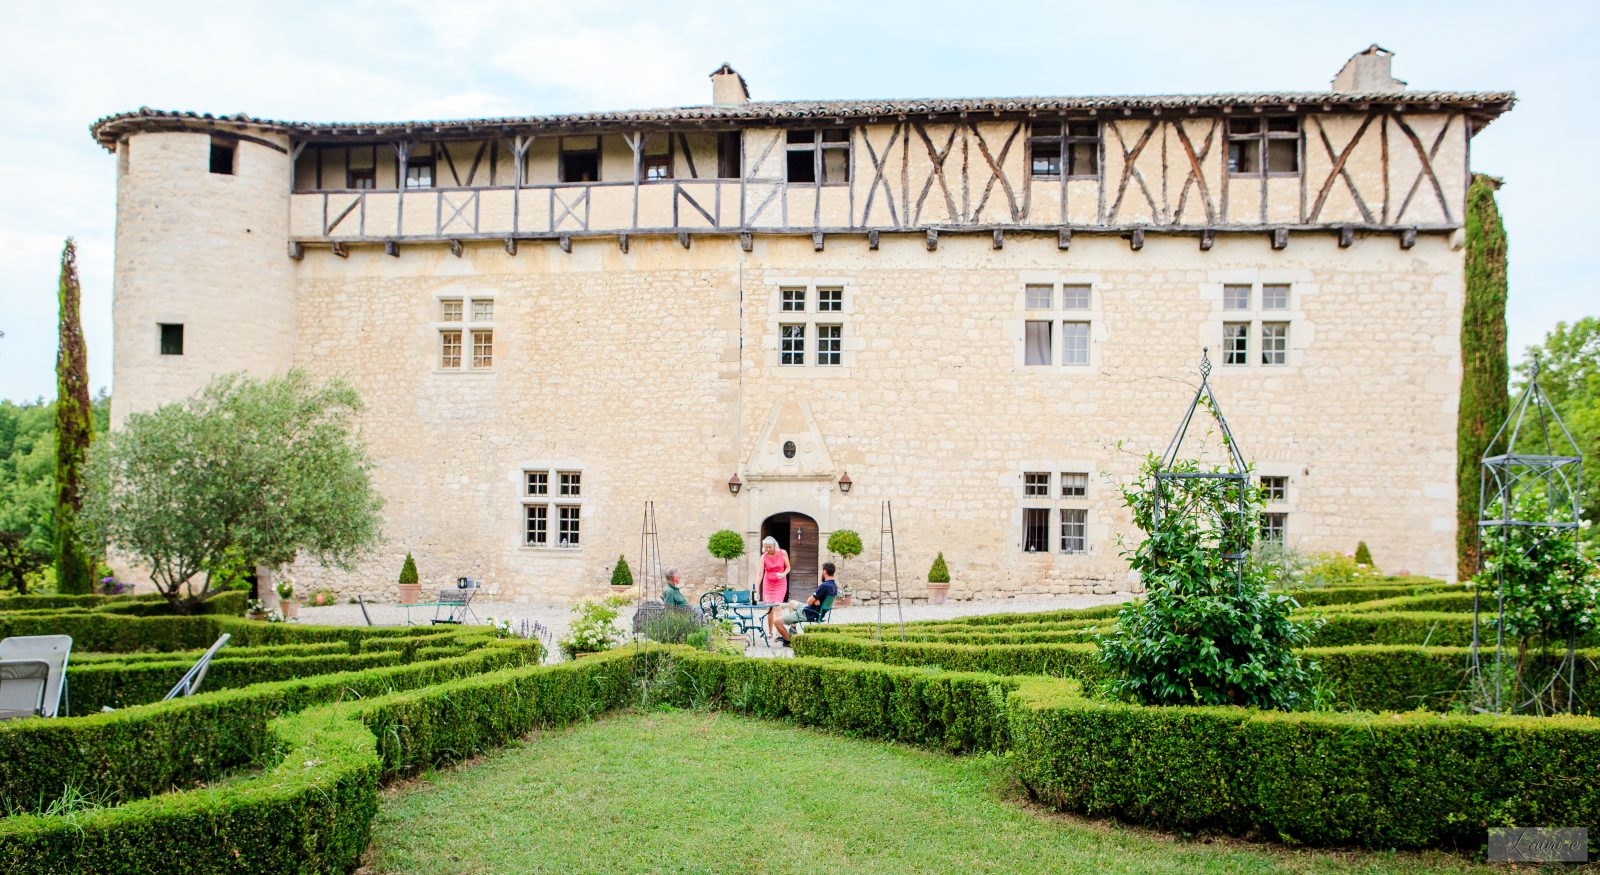 Château de Mayrargues